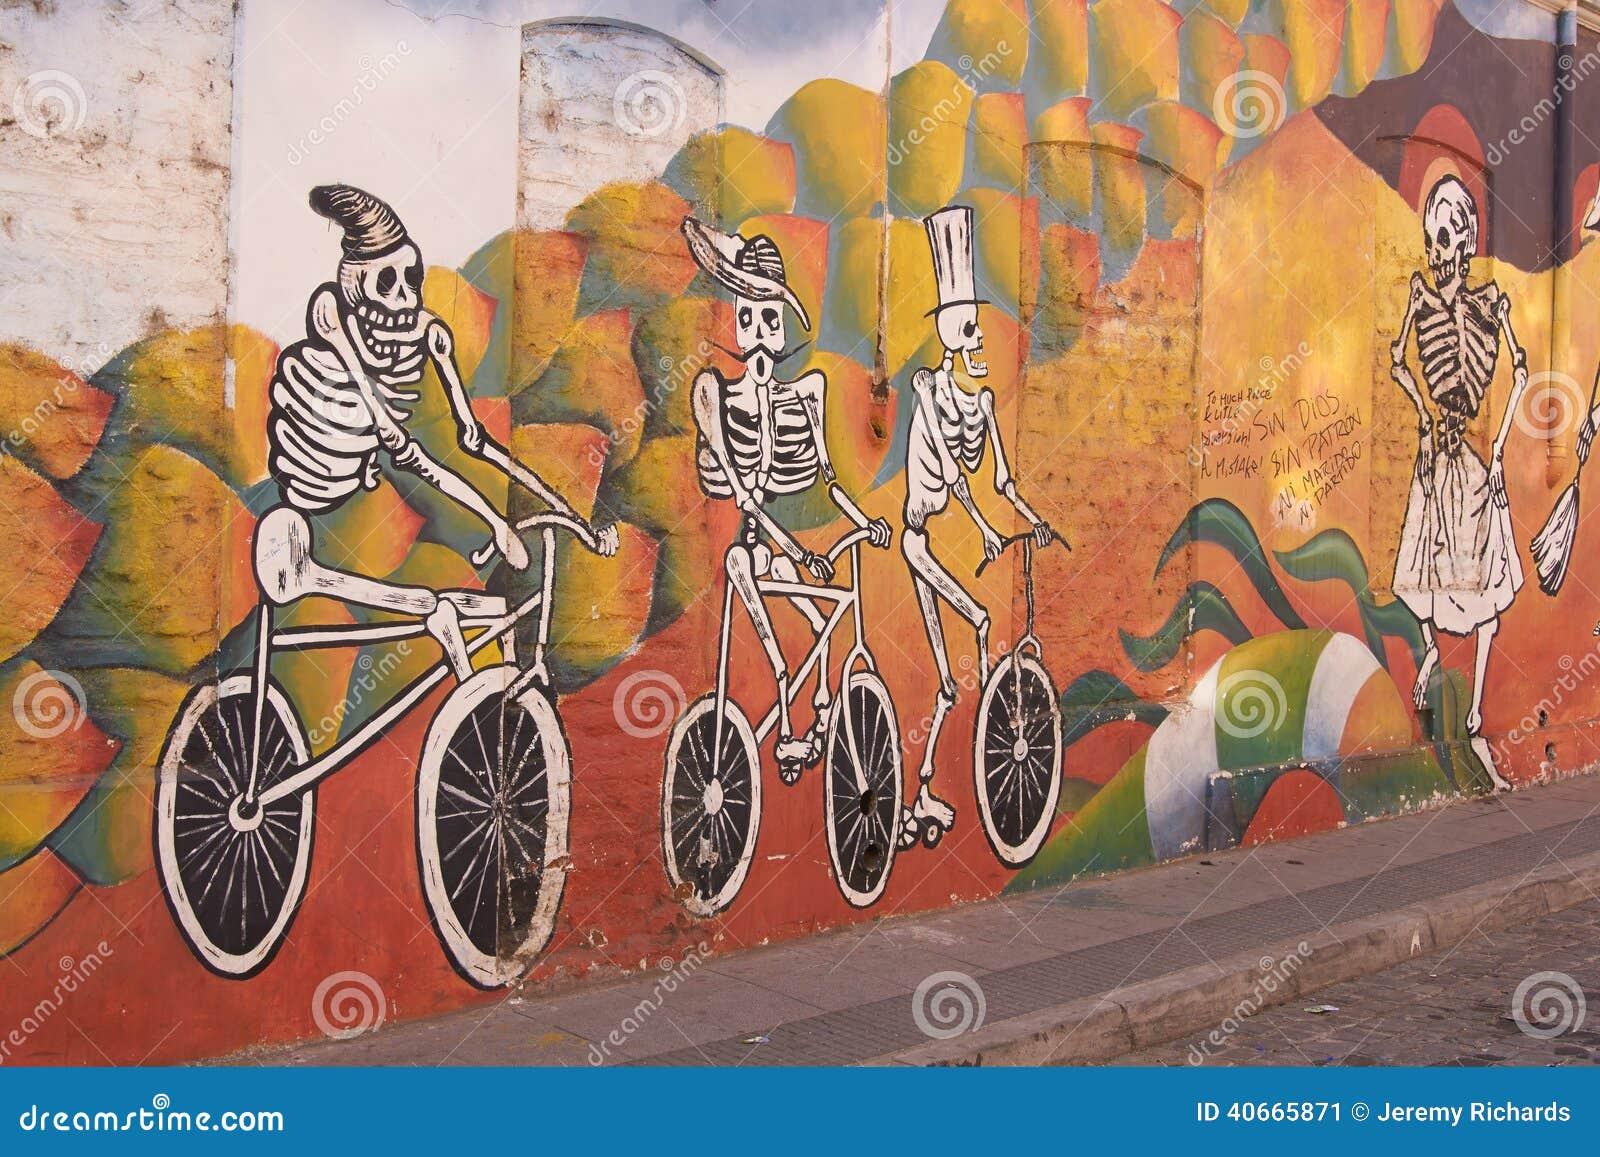 Peintures murales de valparaiso photo ditorial image for Peintures murales